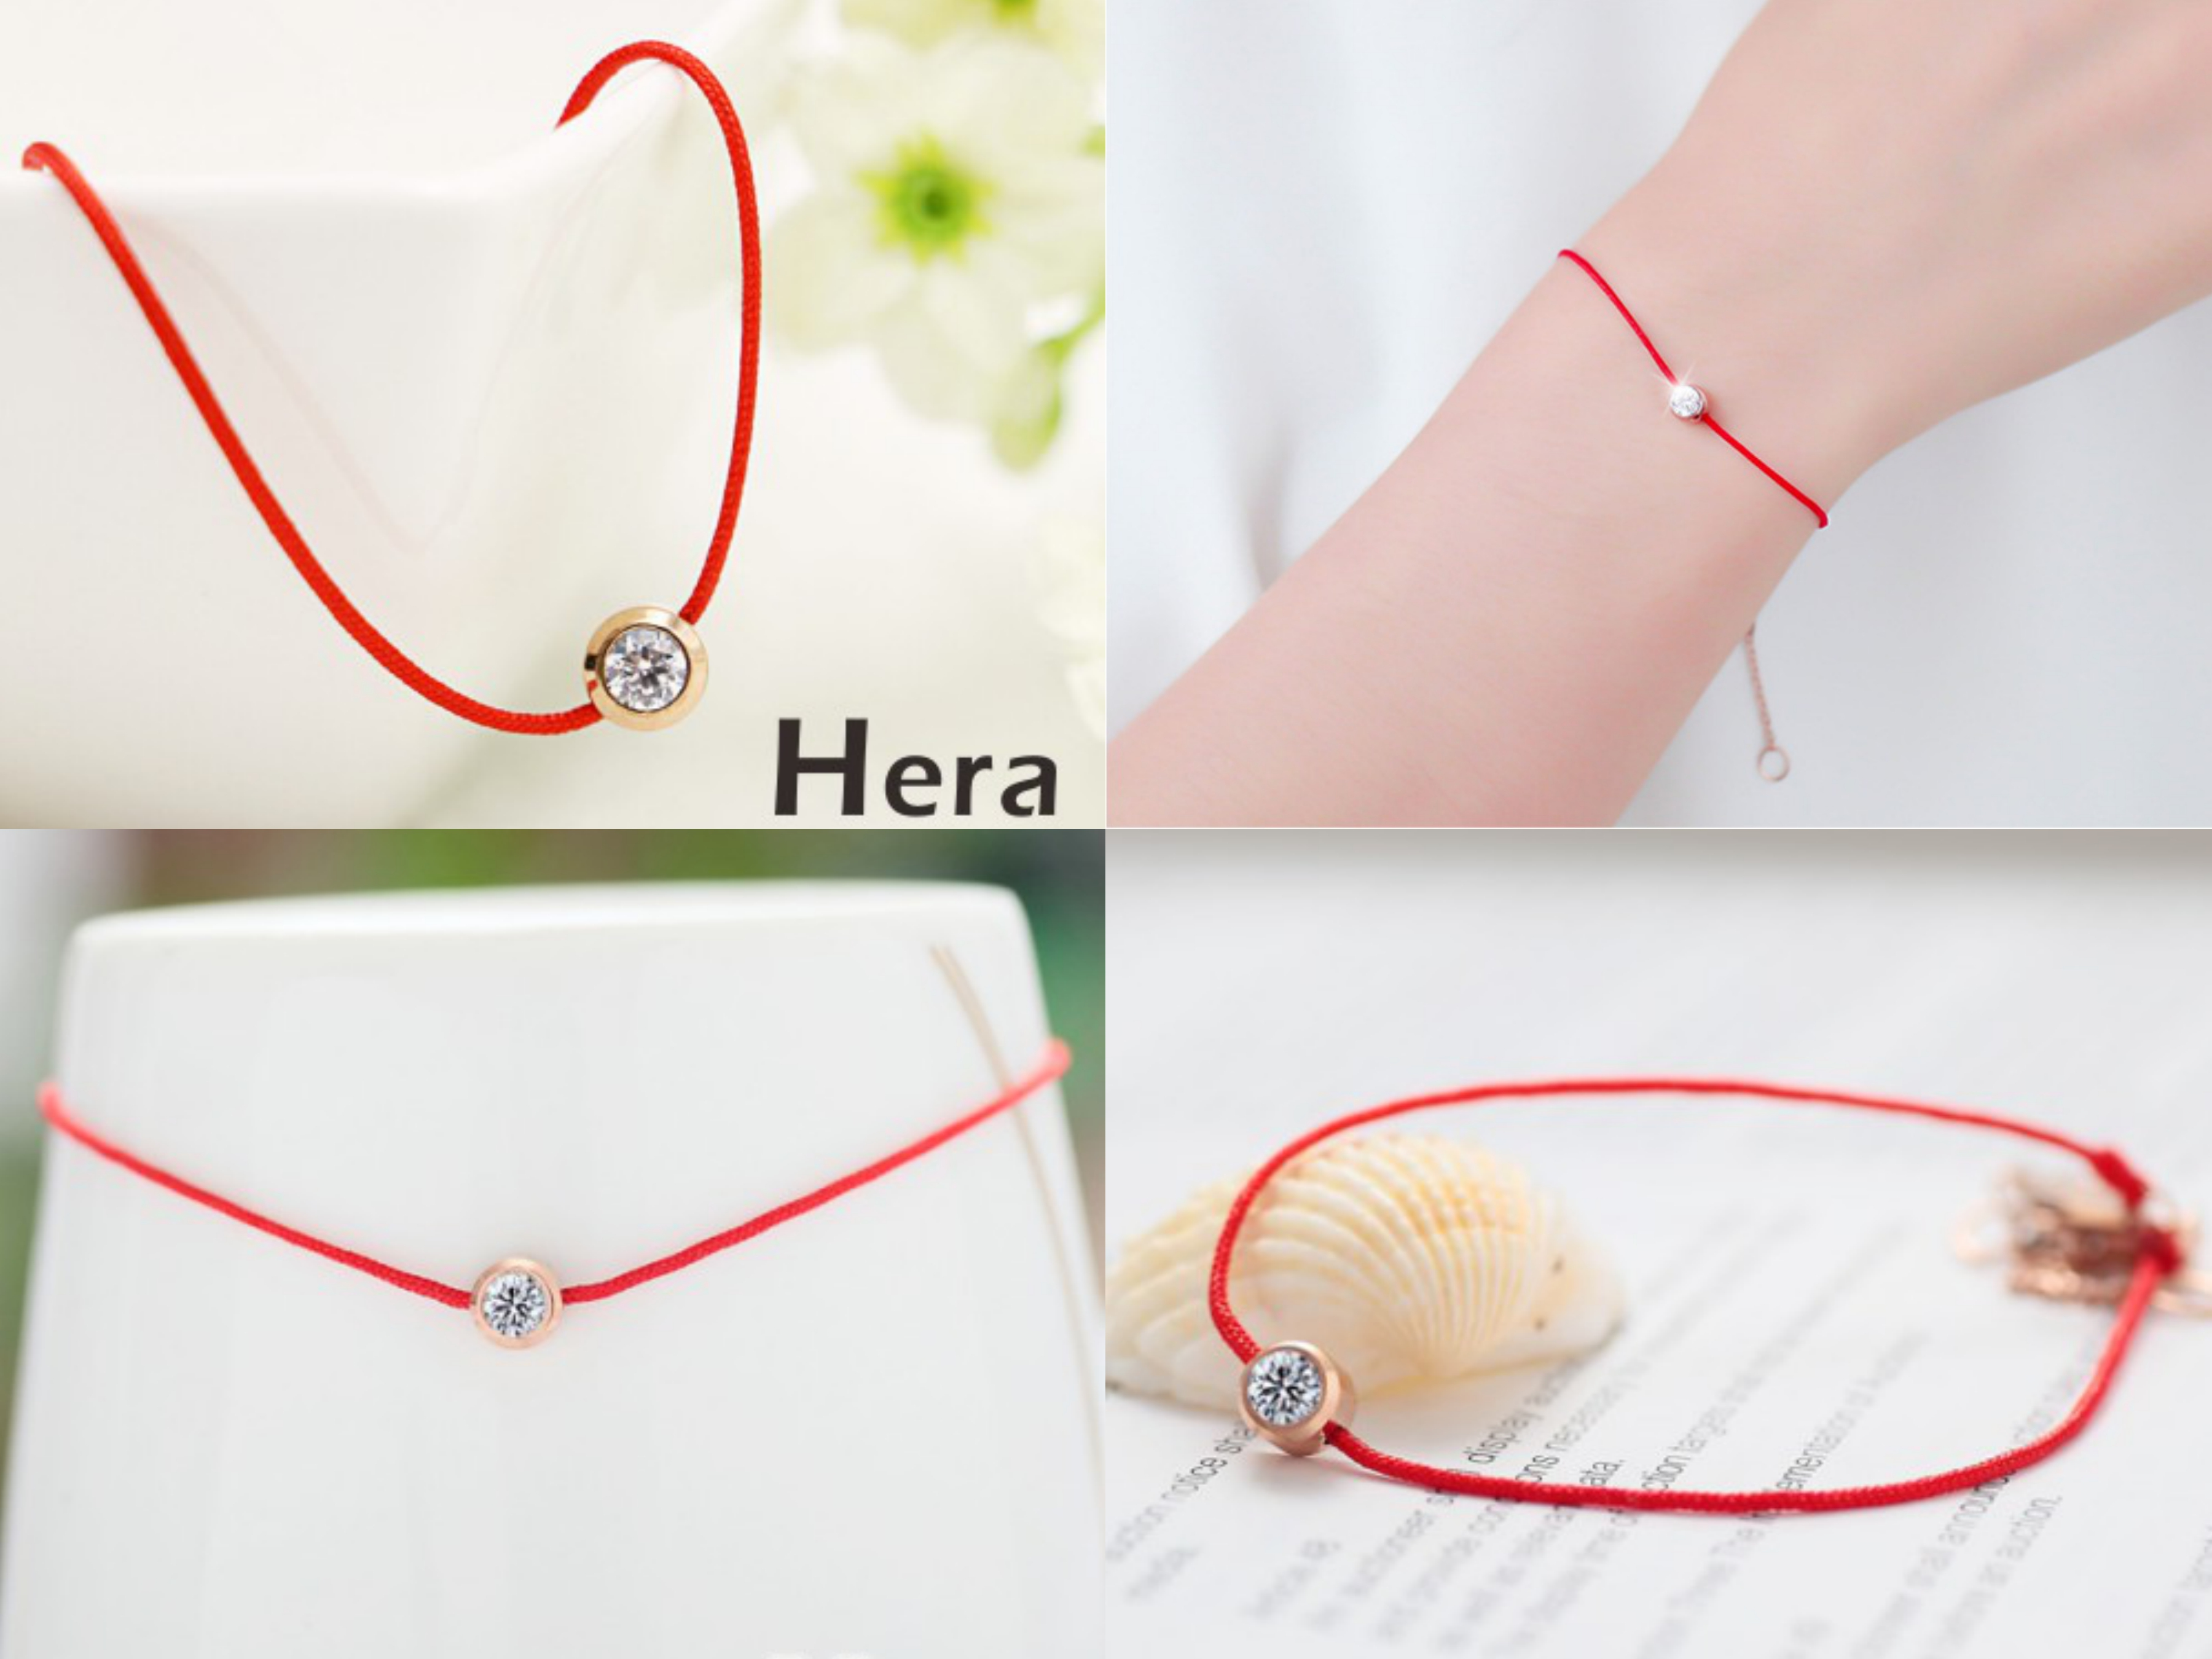 Hera赫拉 明星同款鋯石圓鑽轉運招桃花紅繩手鍊 一條會說愛的禮物,閃耀大鋯石做工精緻亮度UPUP